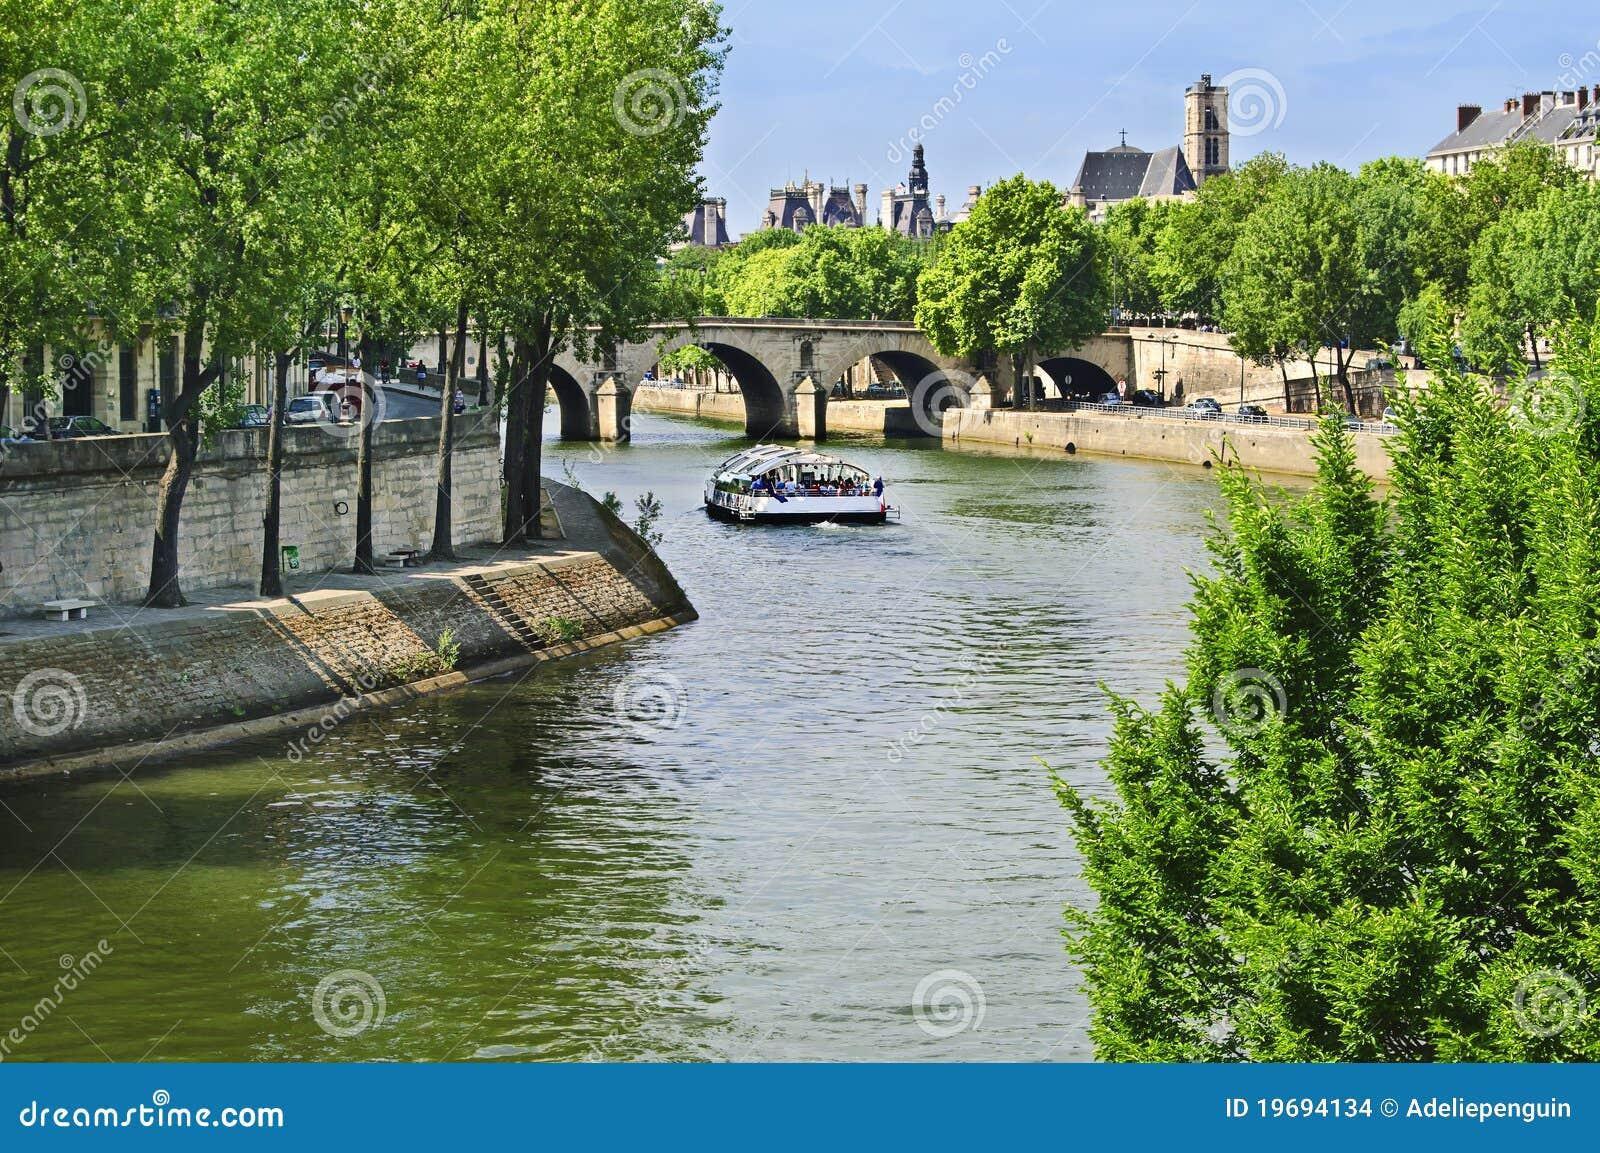 Paris, Boat on River Seine stock photo. Image of paris - 19694134